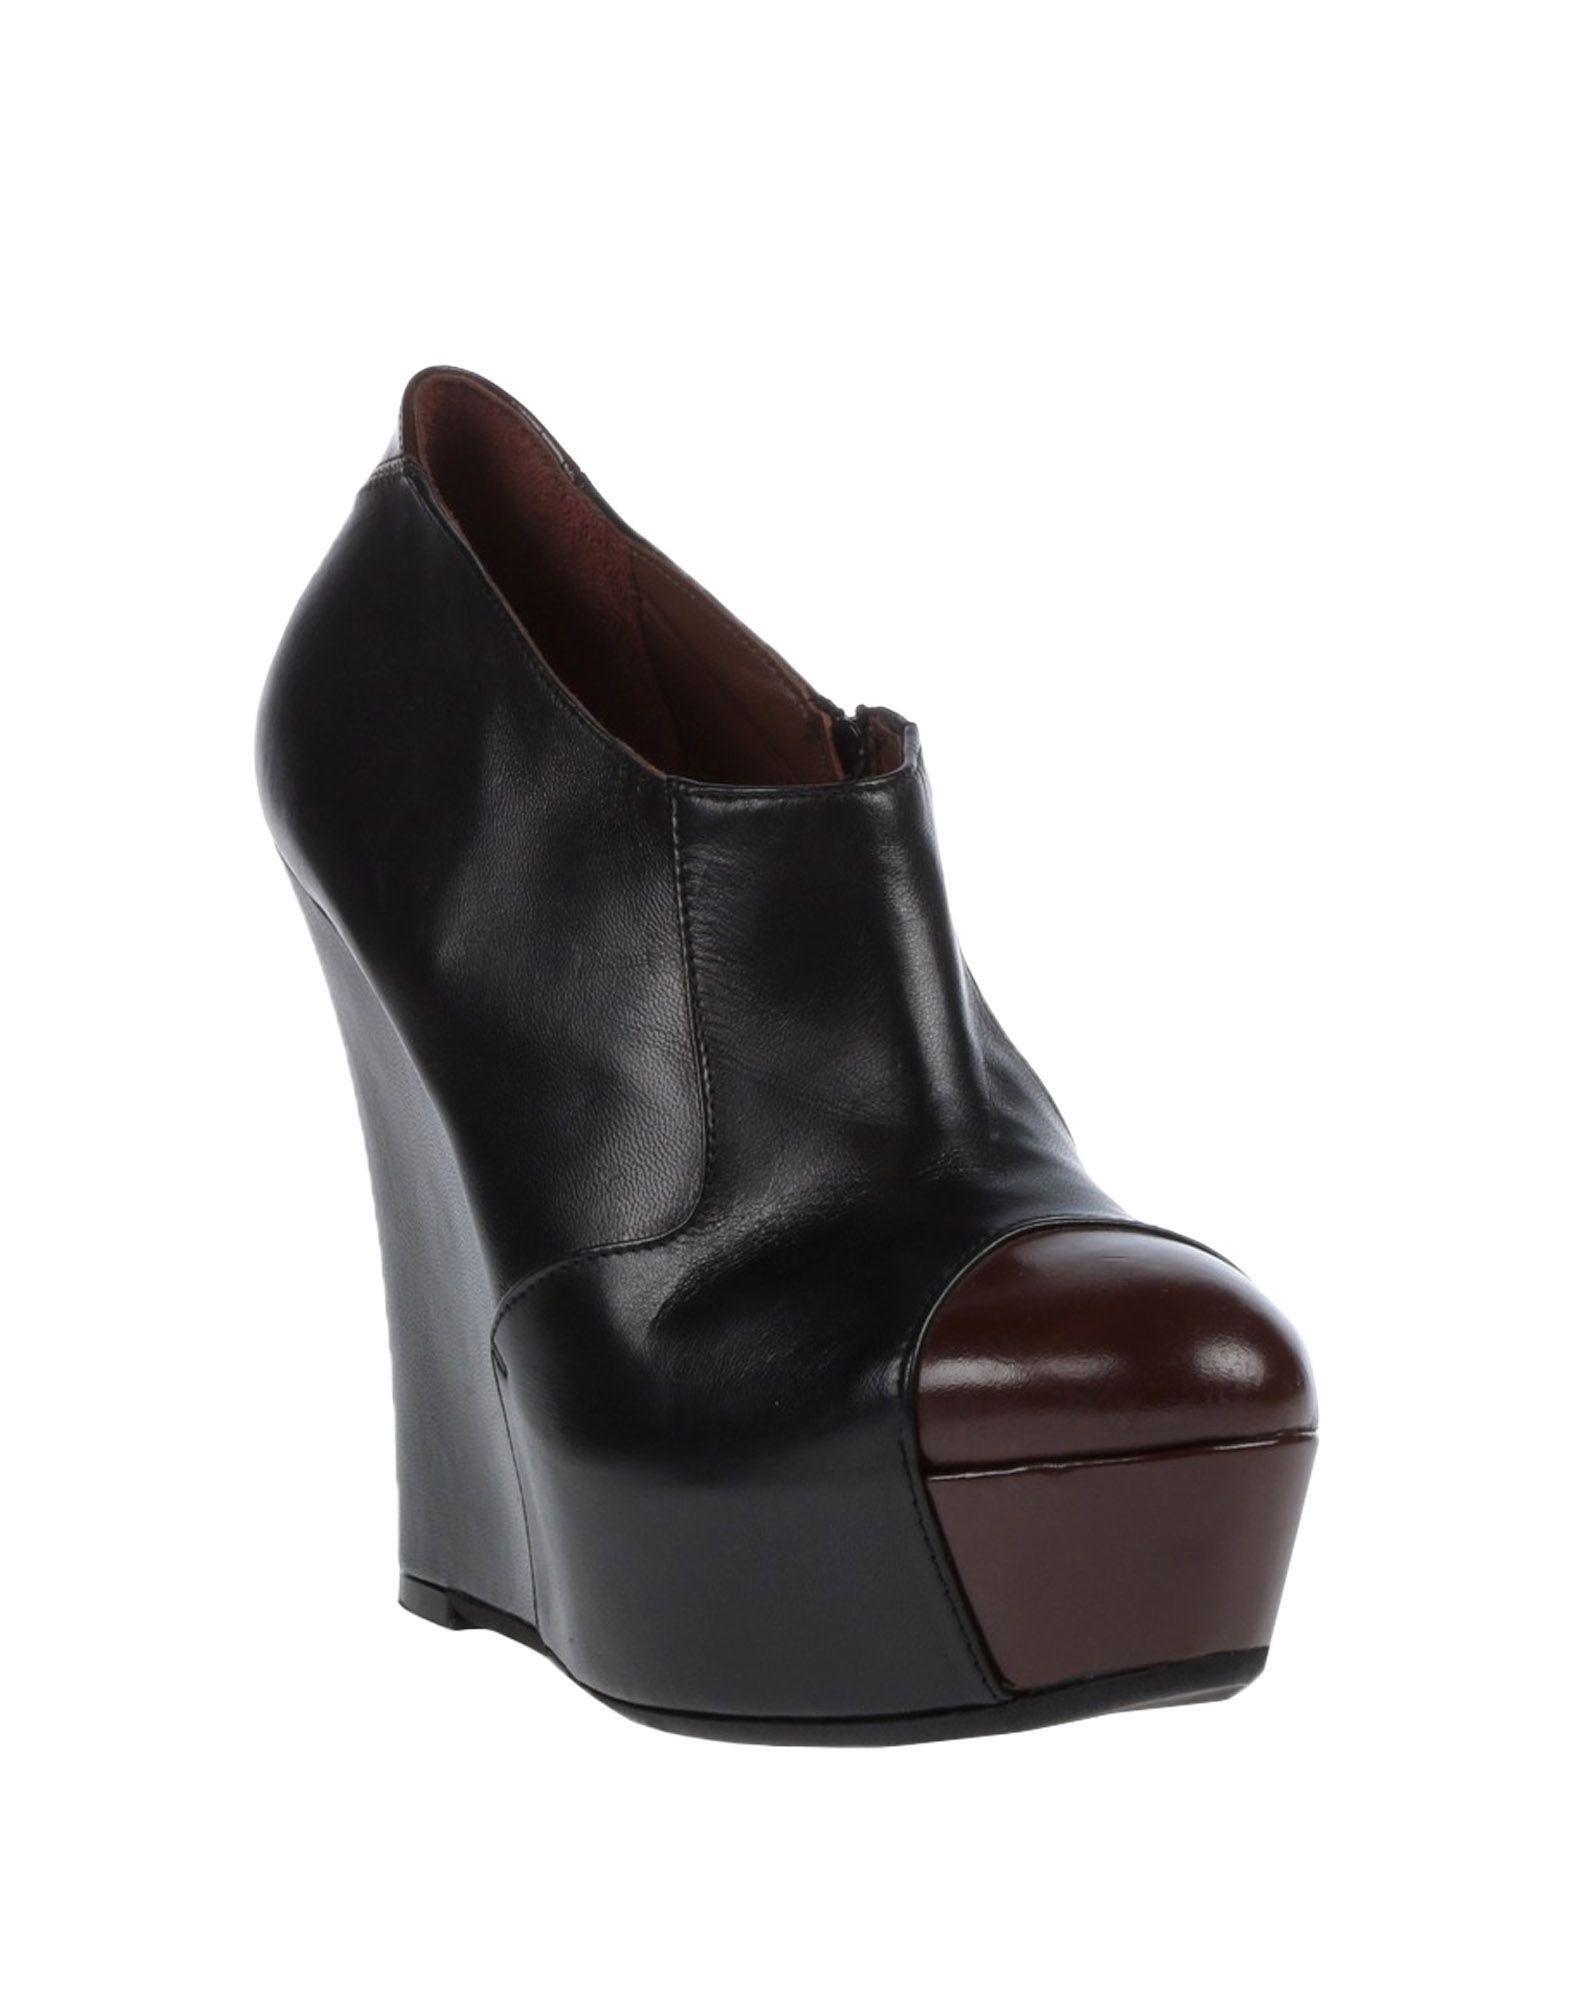 Fiorifrancesi Stiefelette Damen  Schuhe 11536099IS Gute Qualität beliebte Schuhe  ea514d